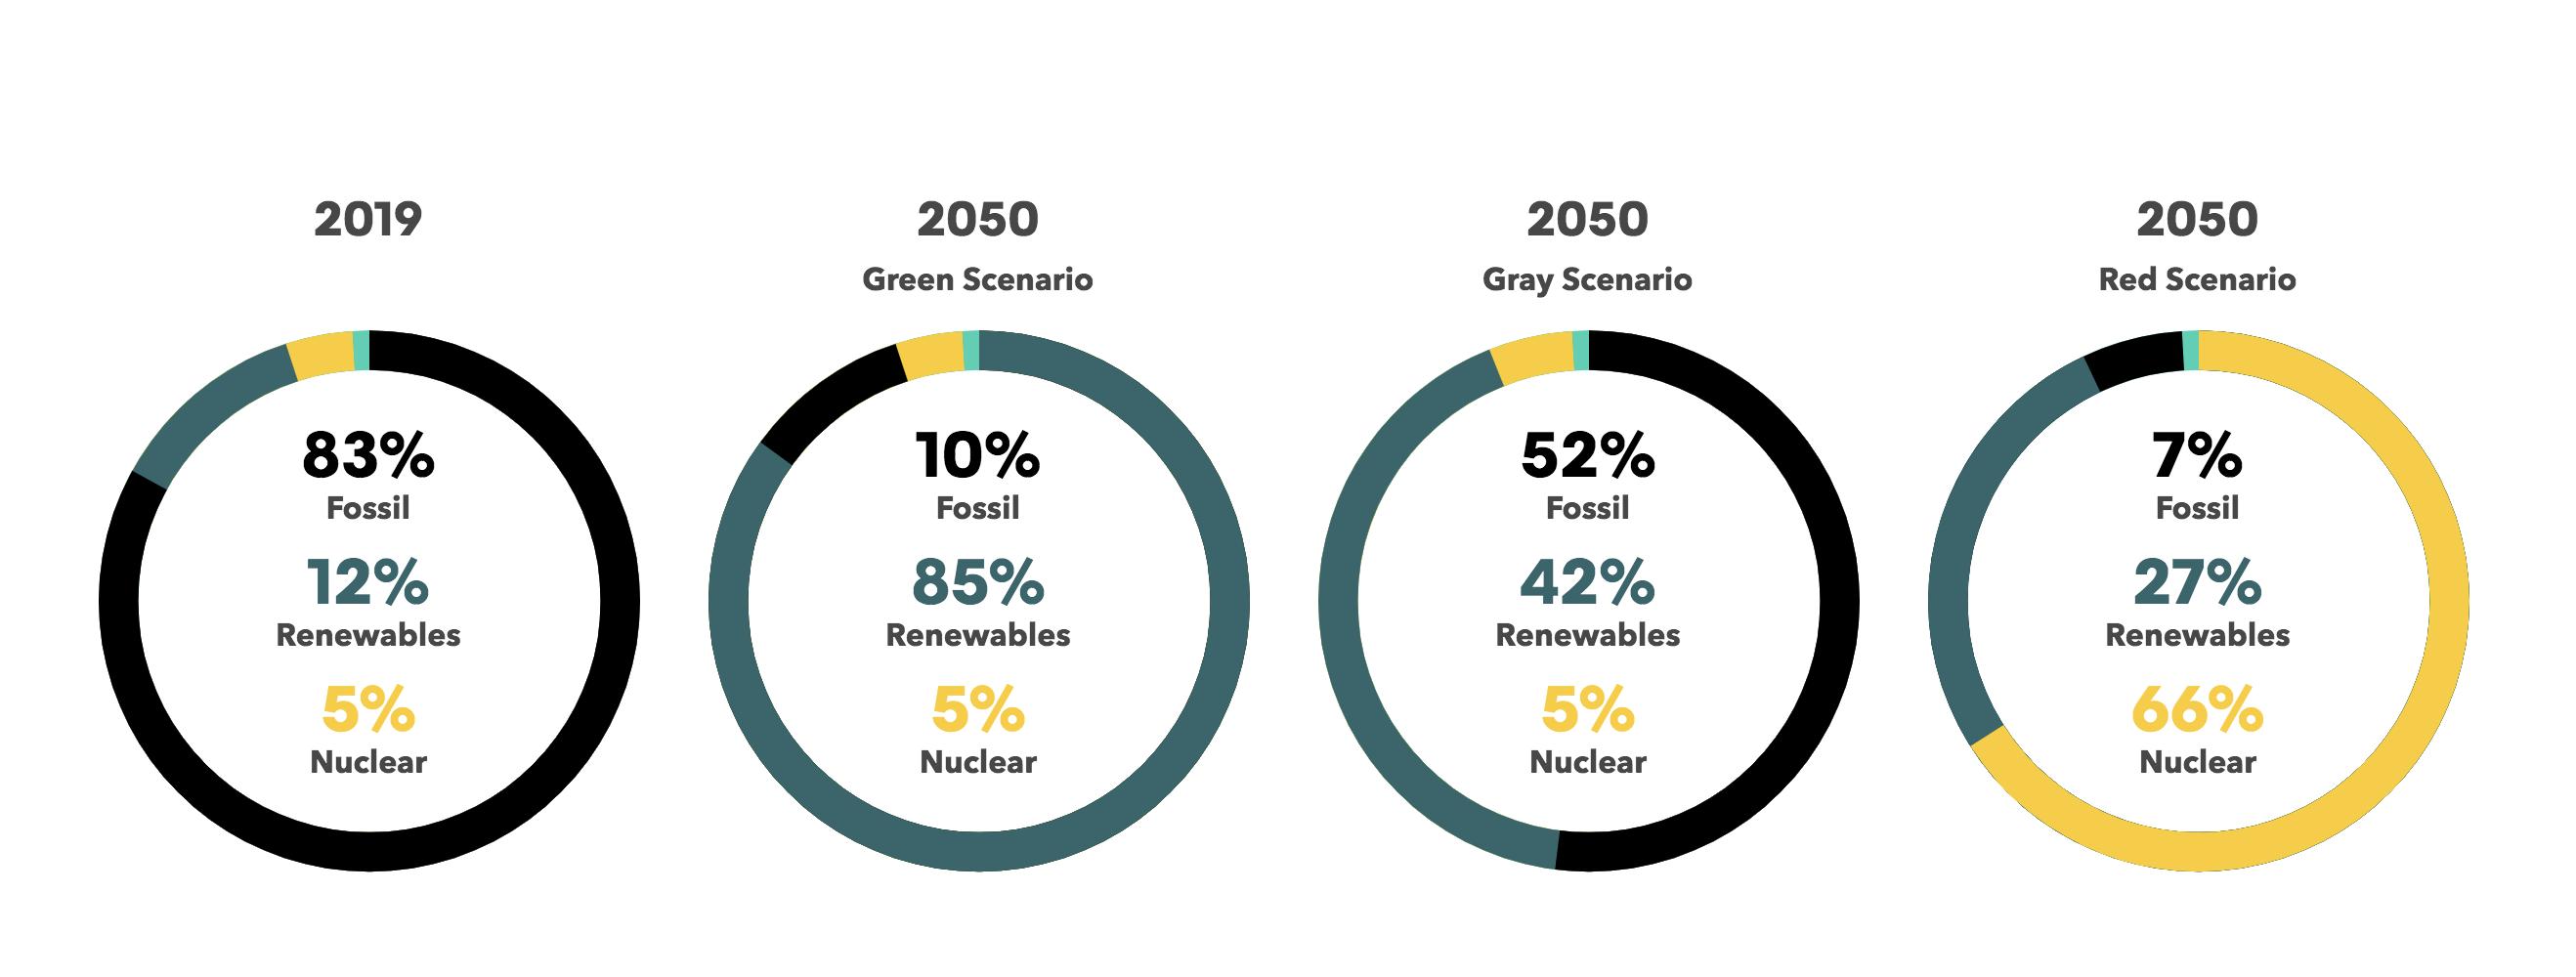 zero emissioni al 2050